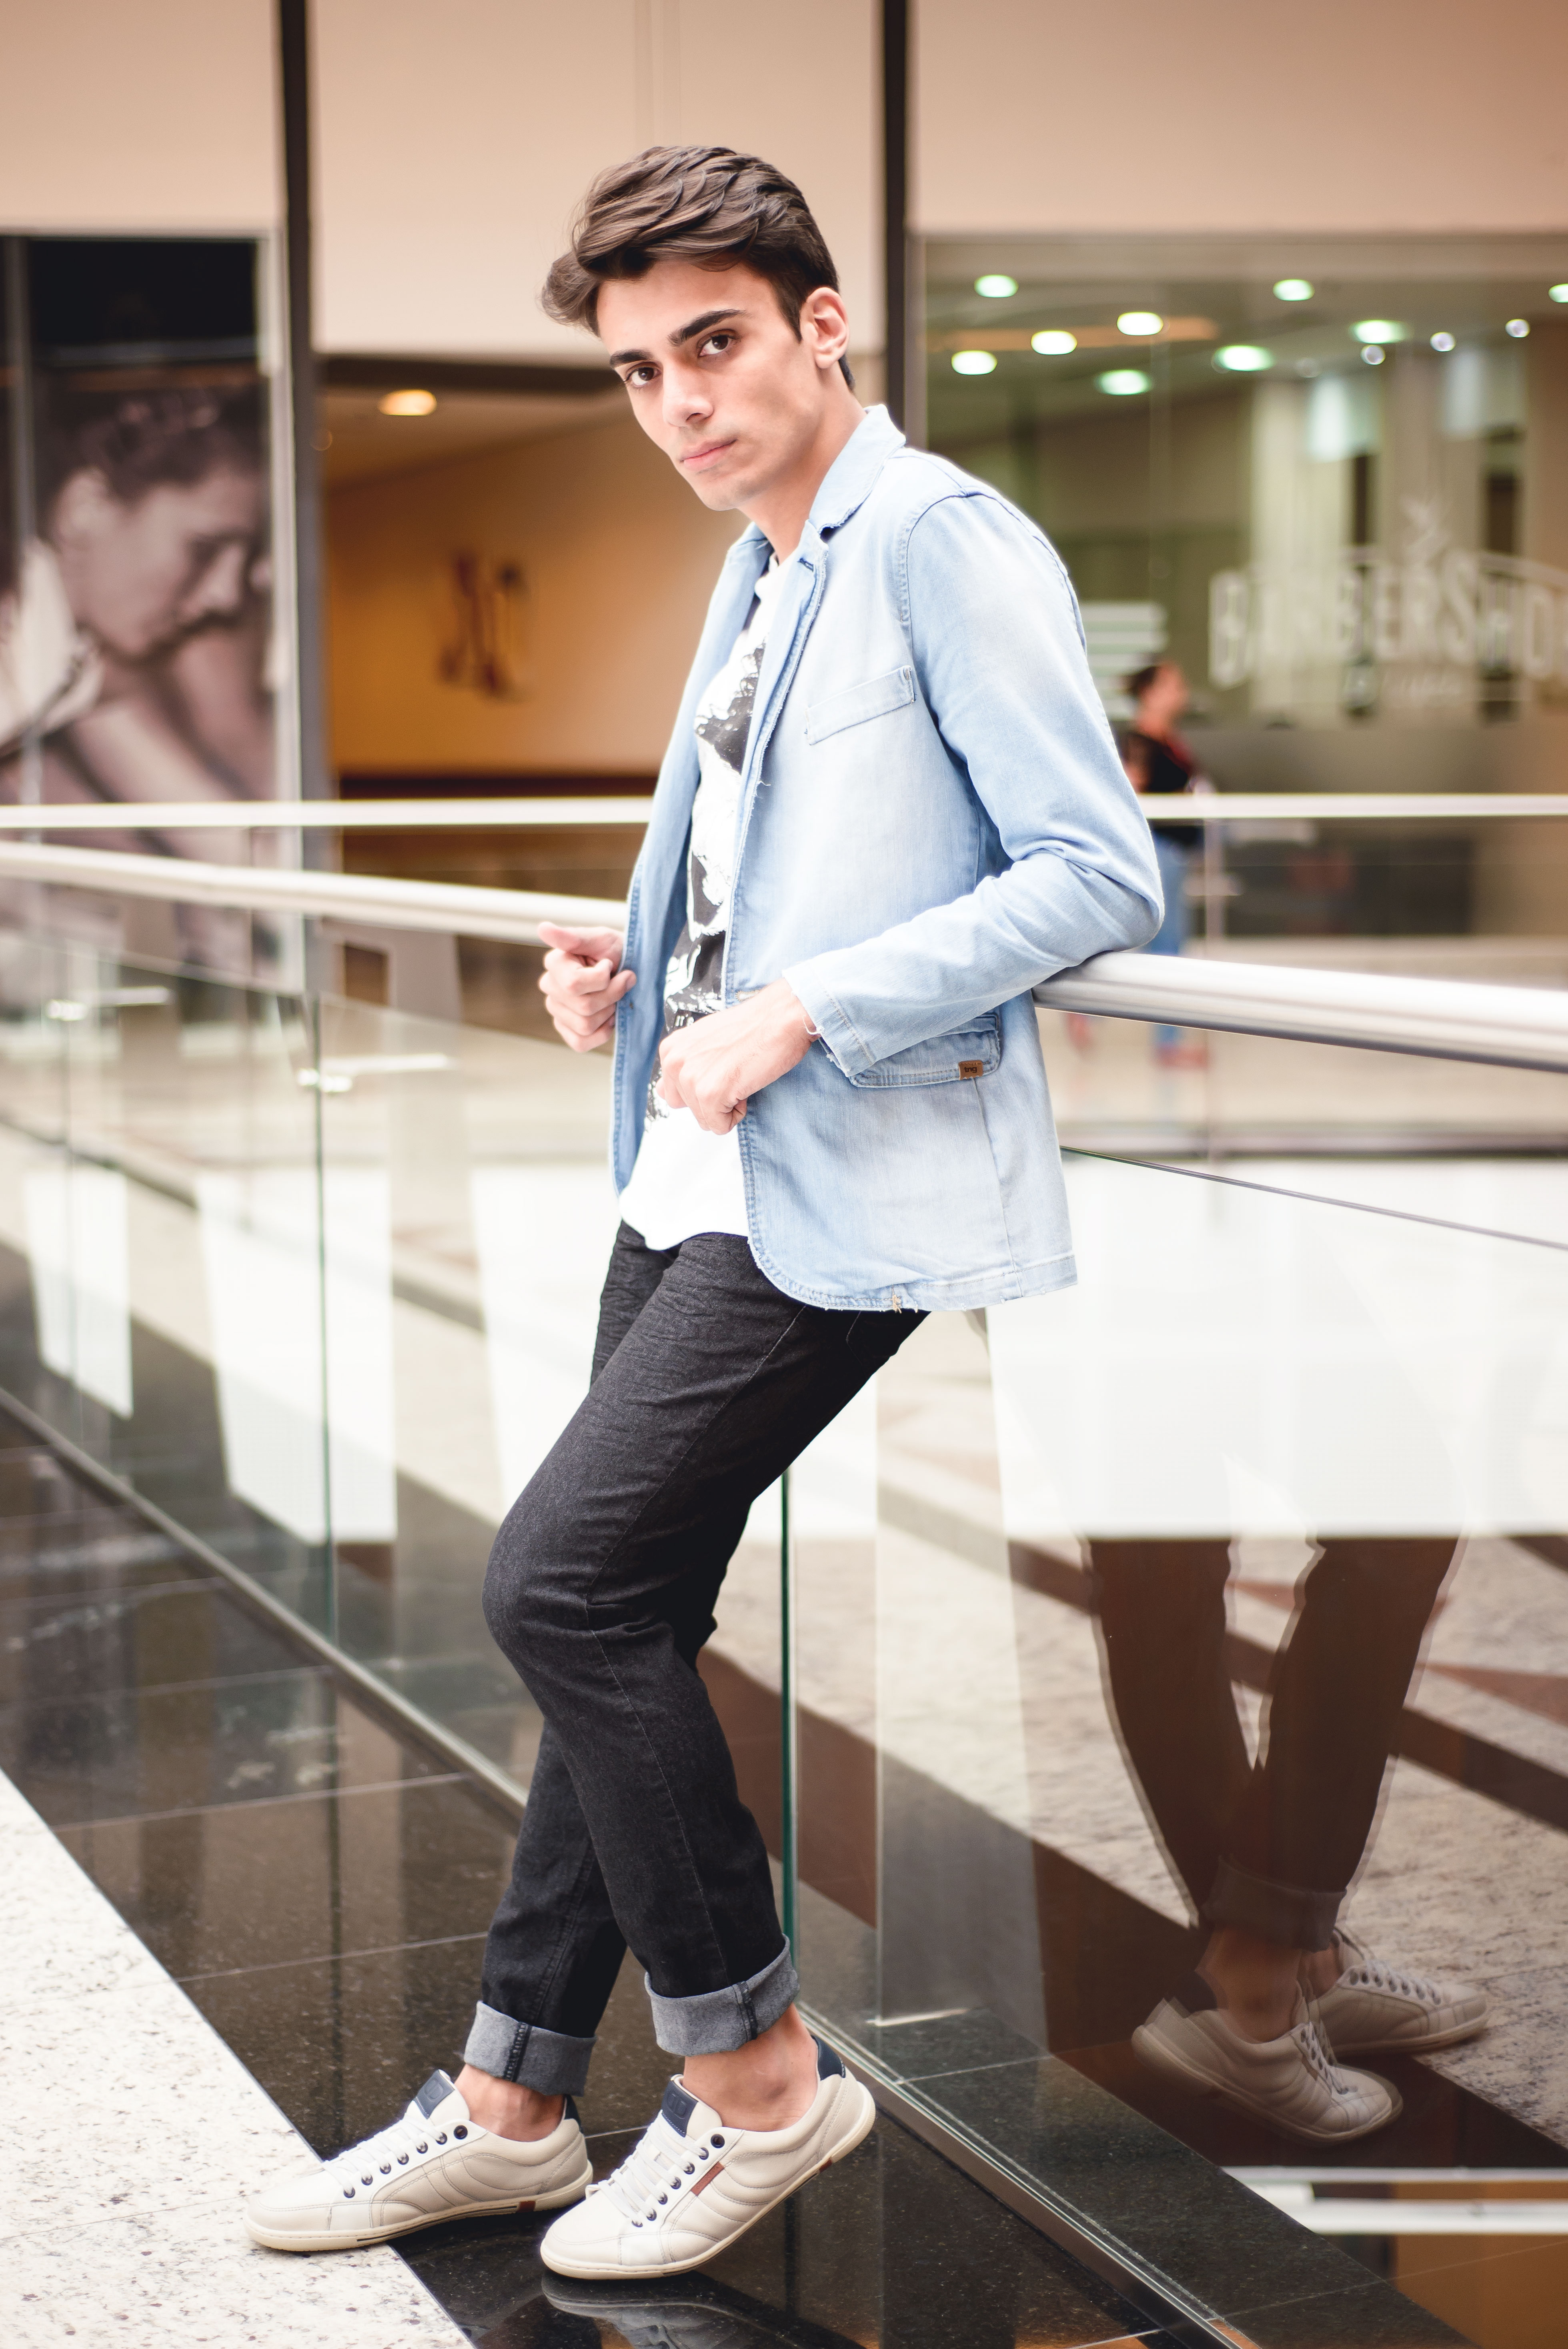 alex cursino, clooset, camila coelho, f hits, patricia abravanel, menswear, blog de moda, blogger, fashion blogger, mens, dicas de moda, roupa masculina, (7)